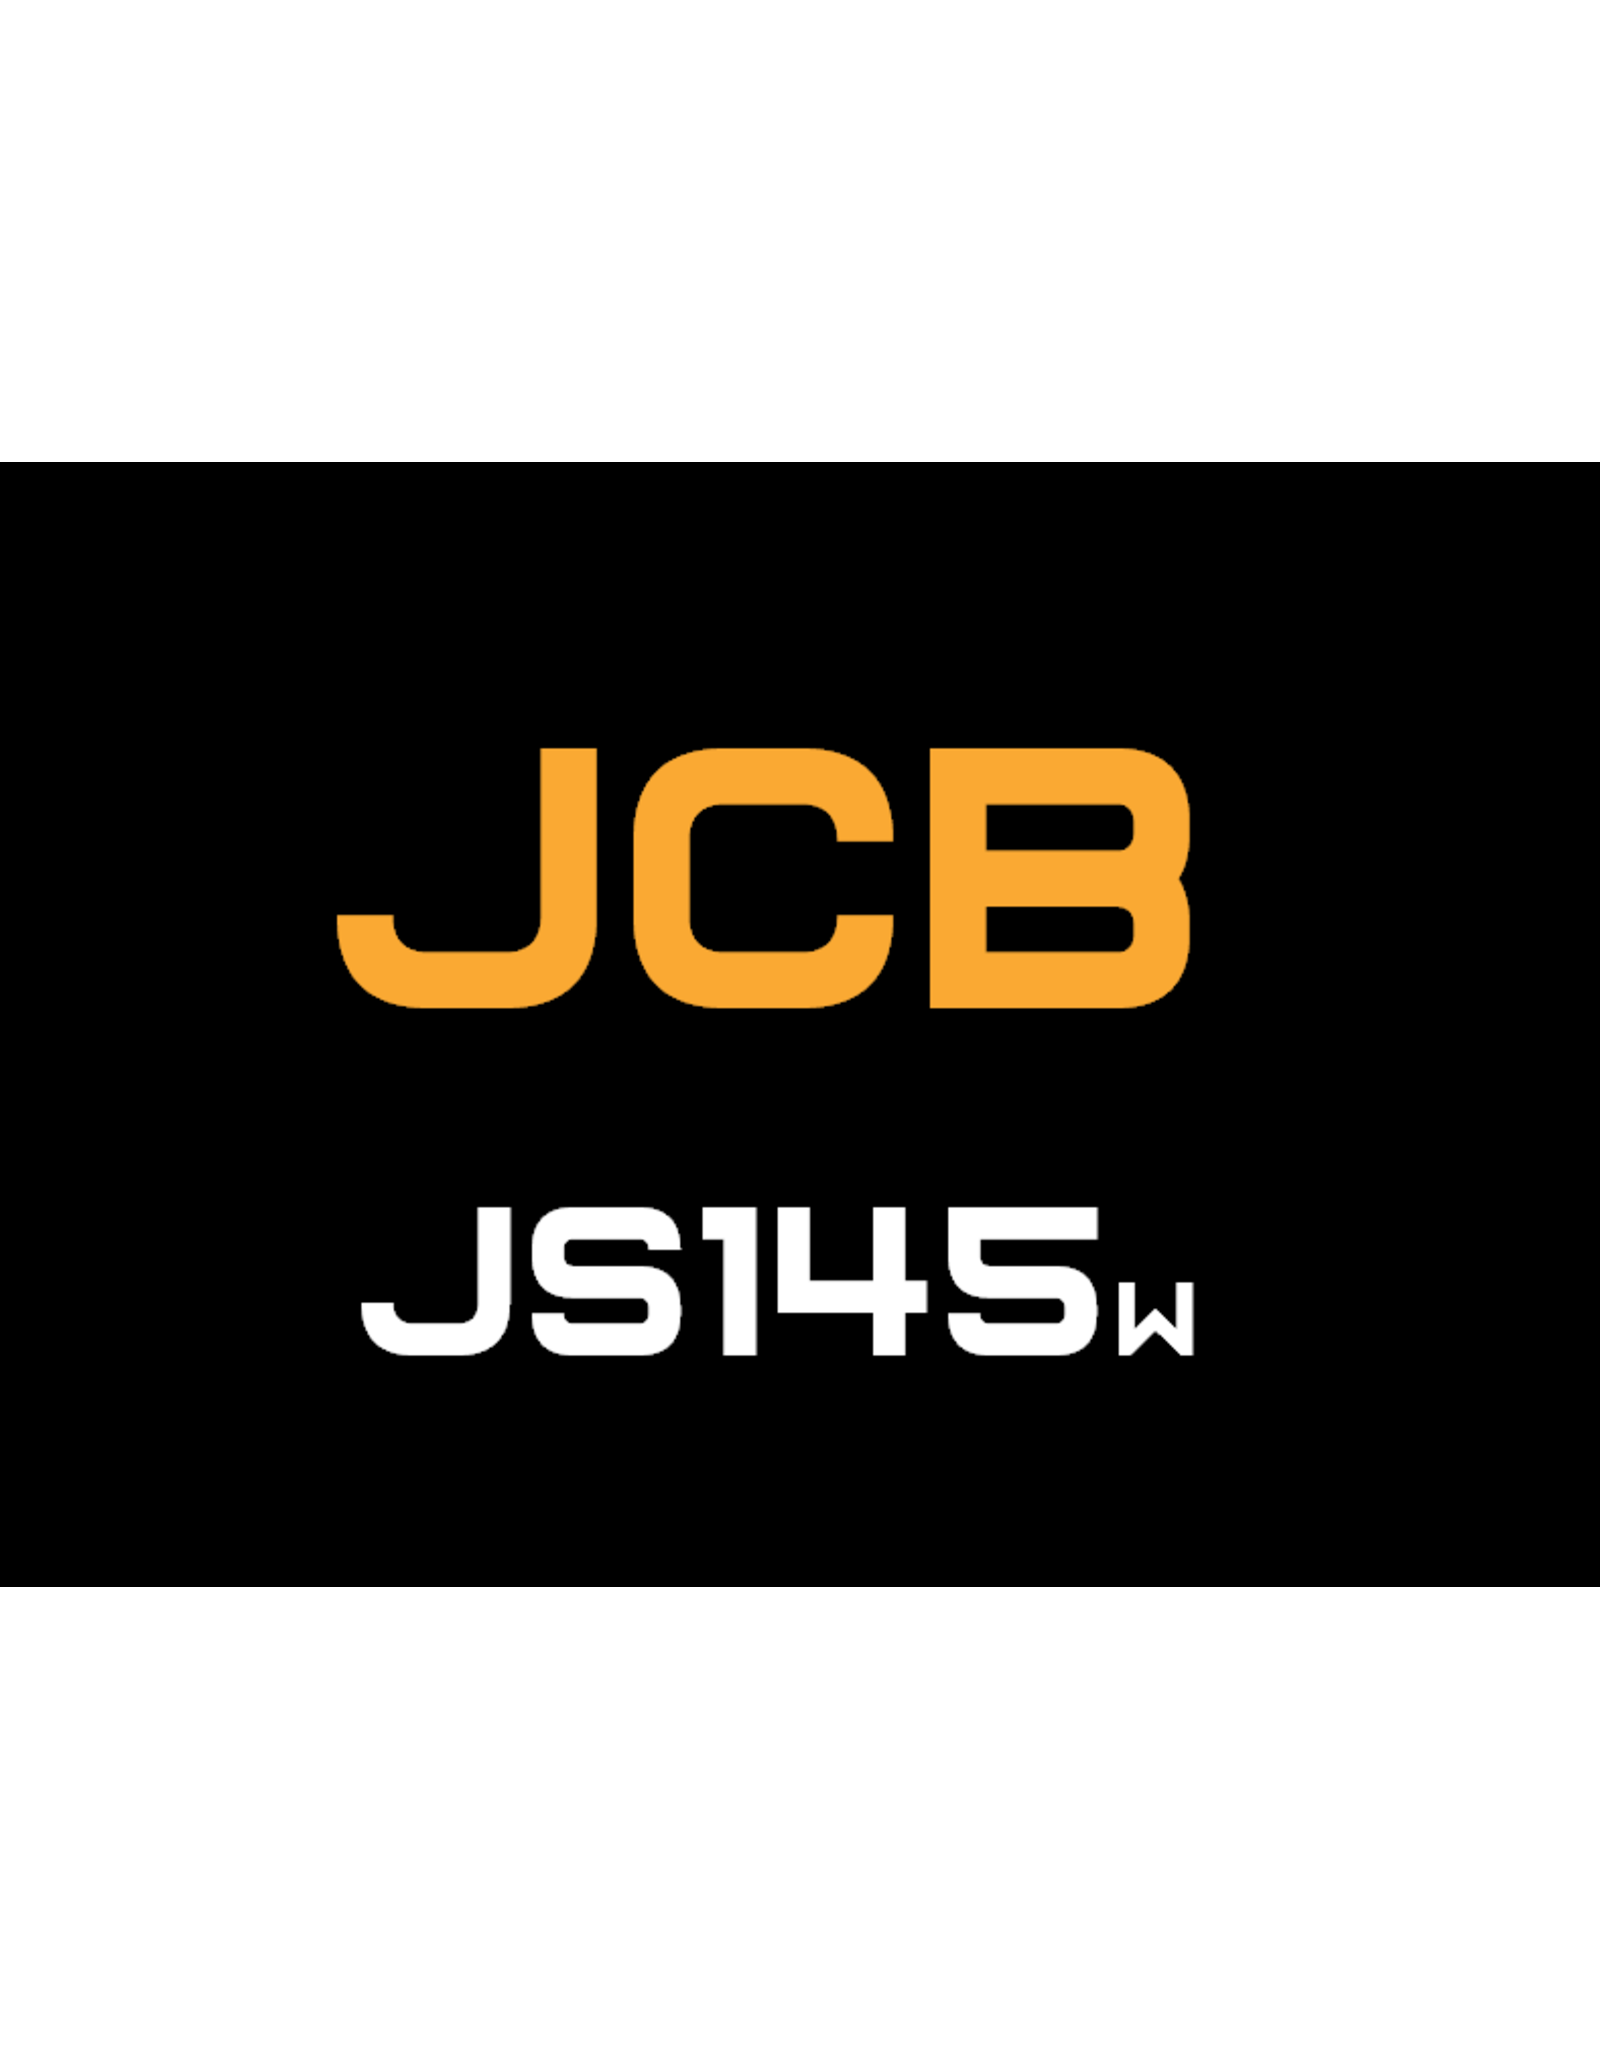 Echle Hartstahl GmbH FOPS pour JCB JS145W